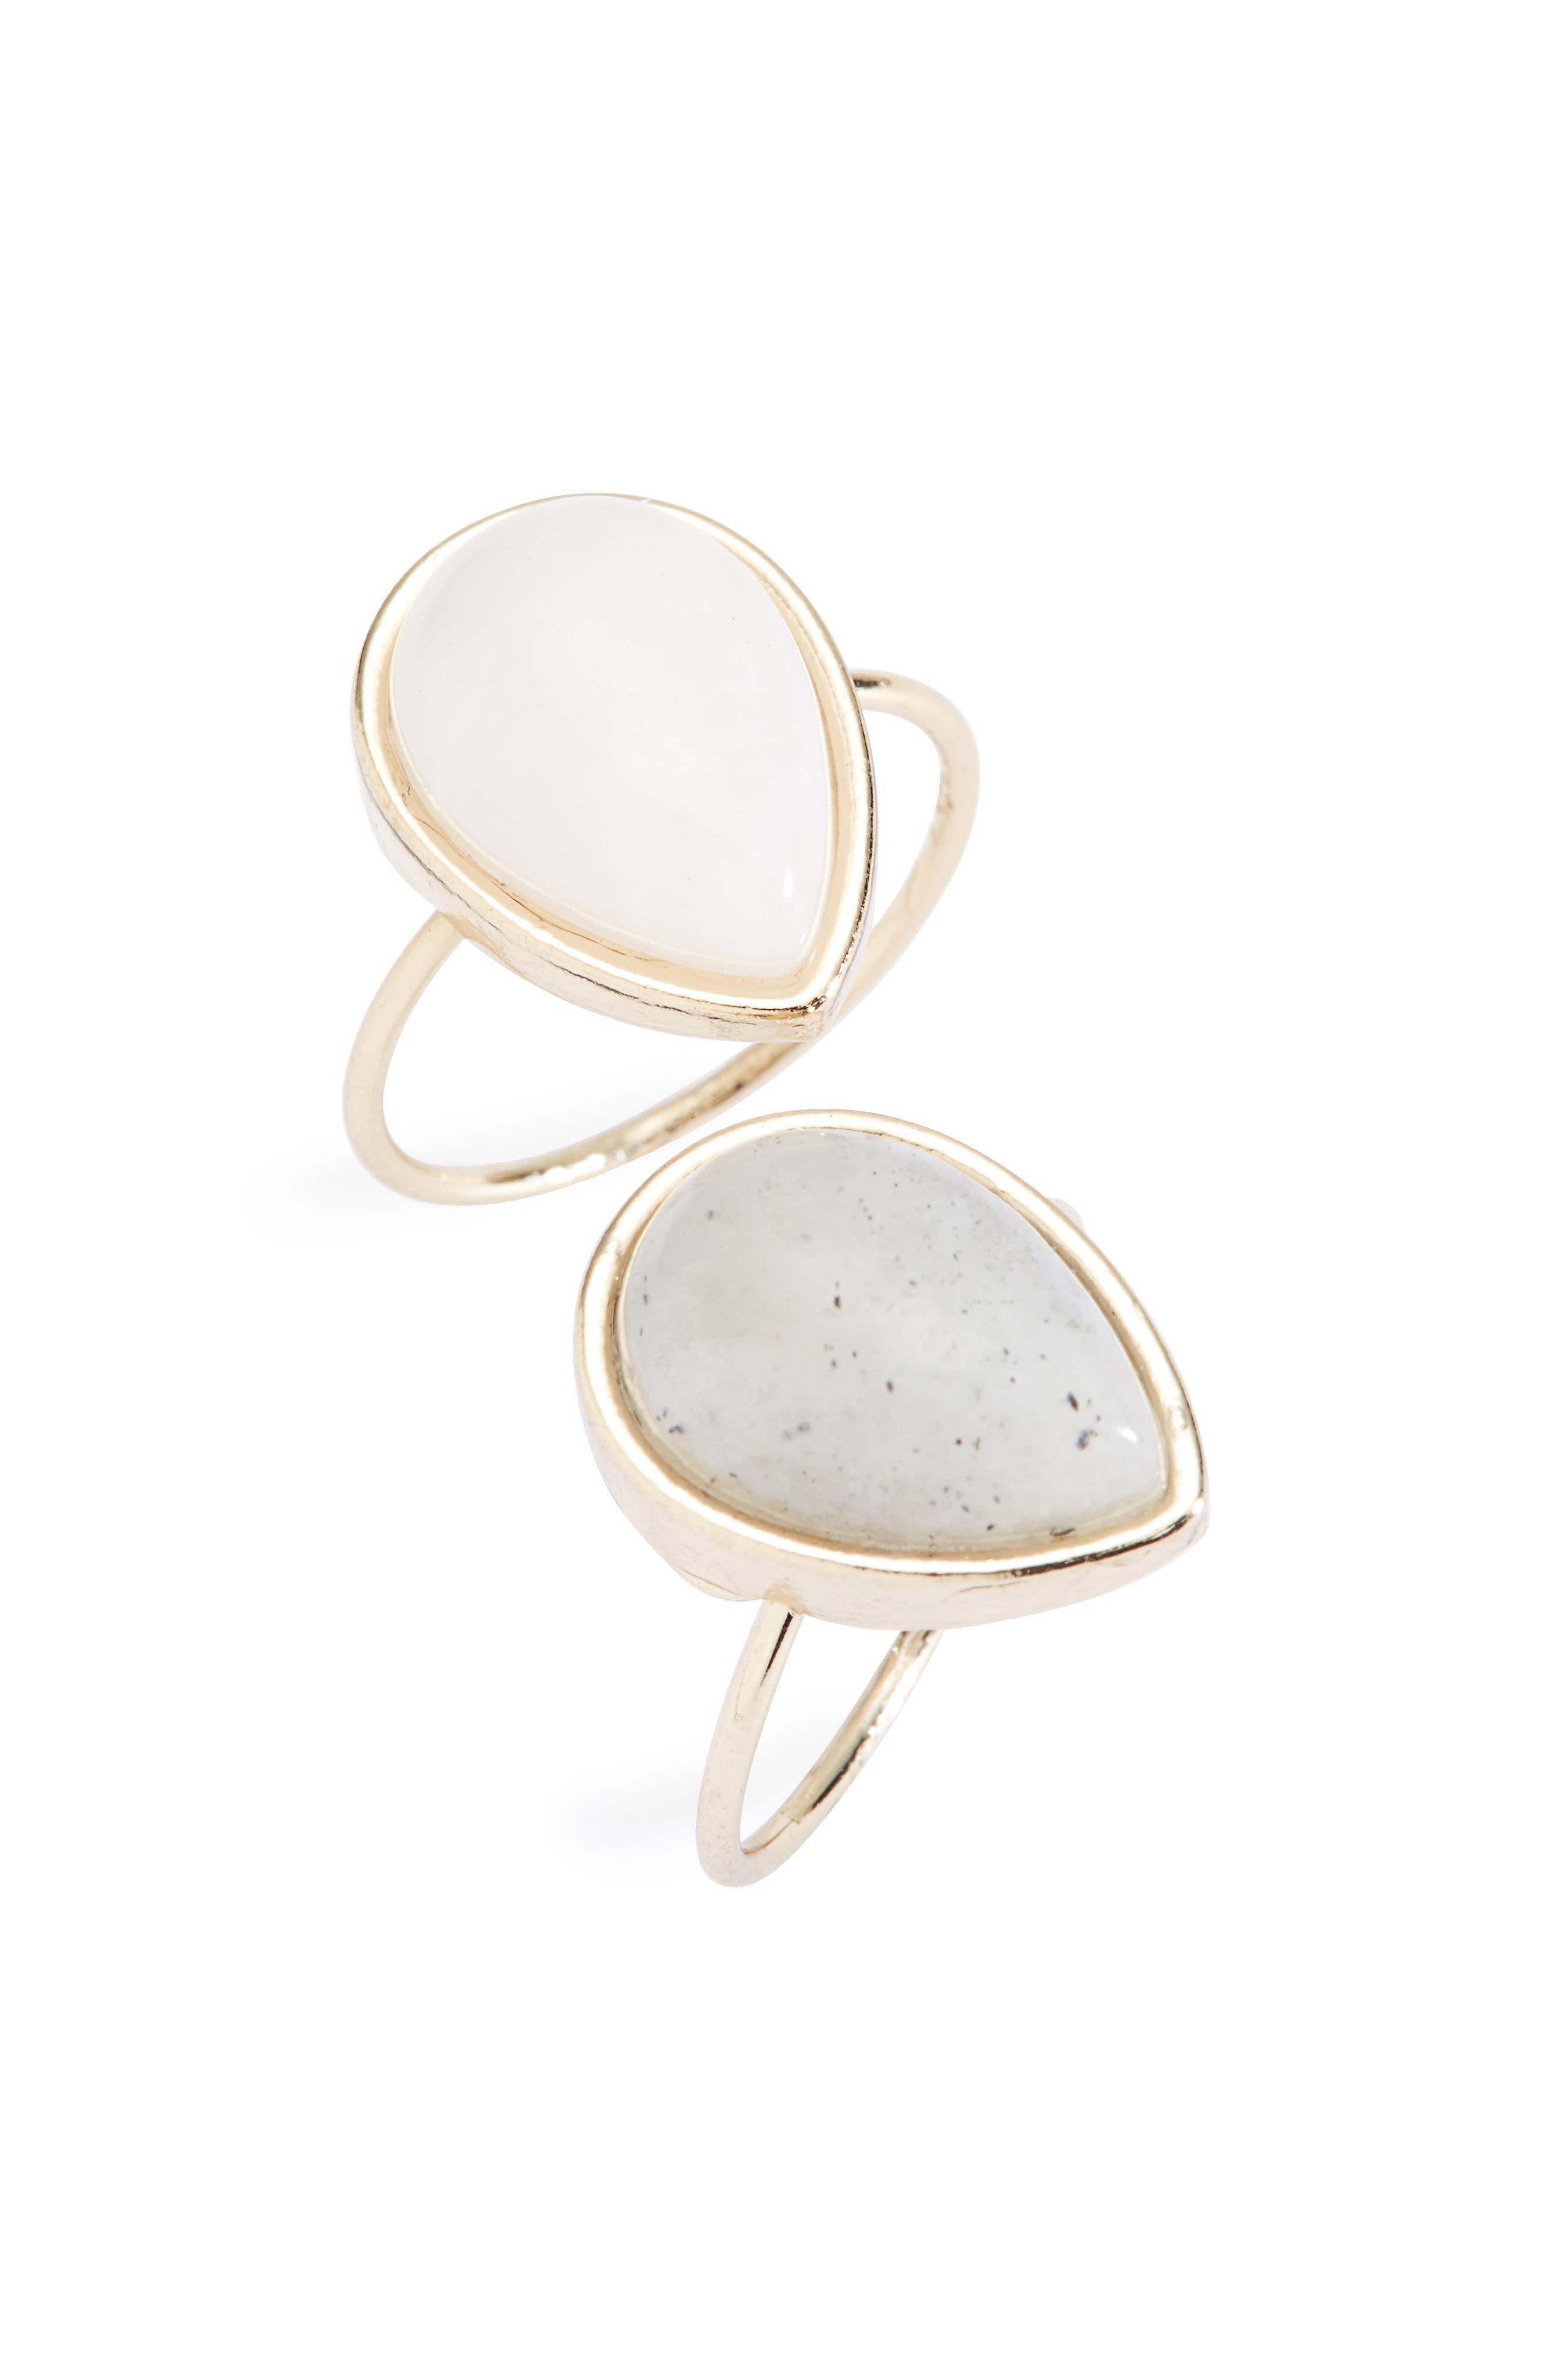 Stone Teardrop Ring,                             Main thumbnail 1, color,                             711